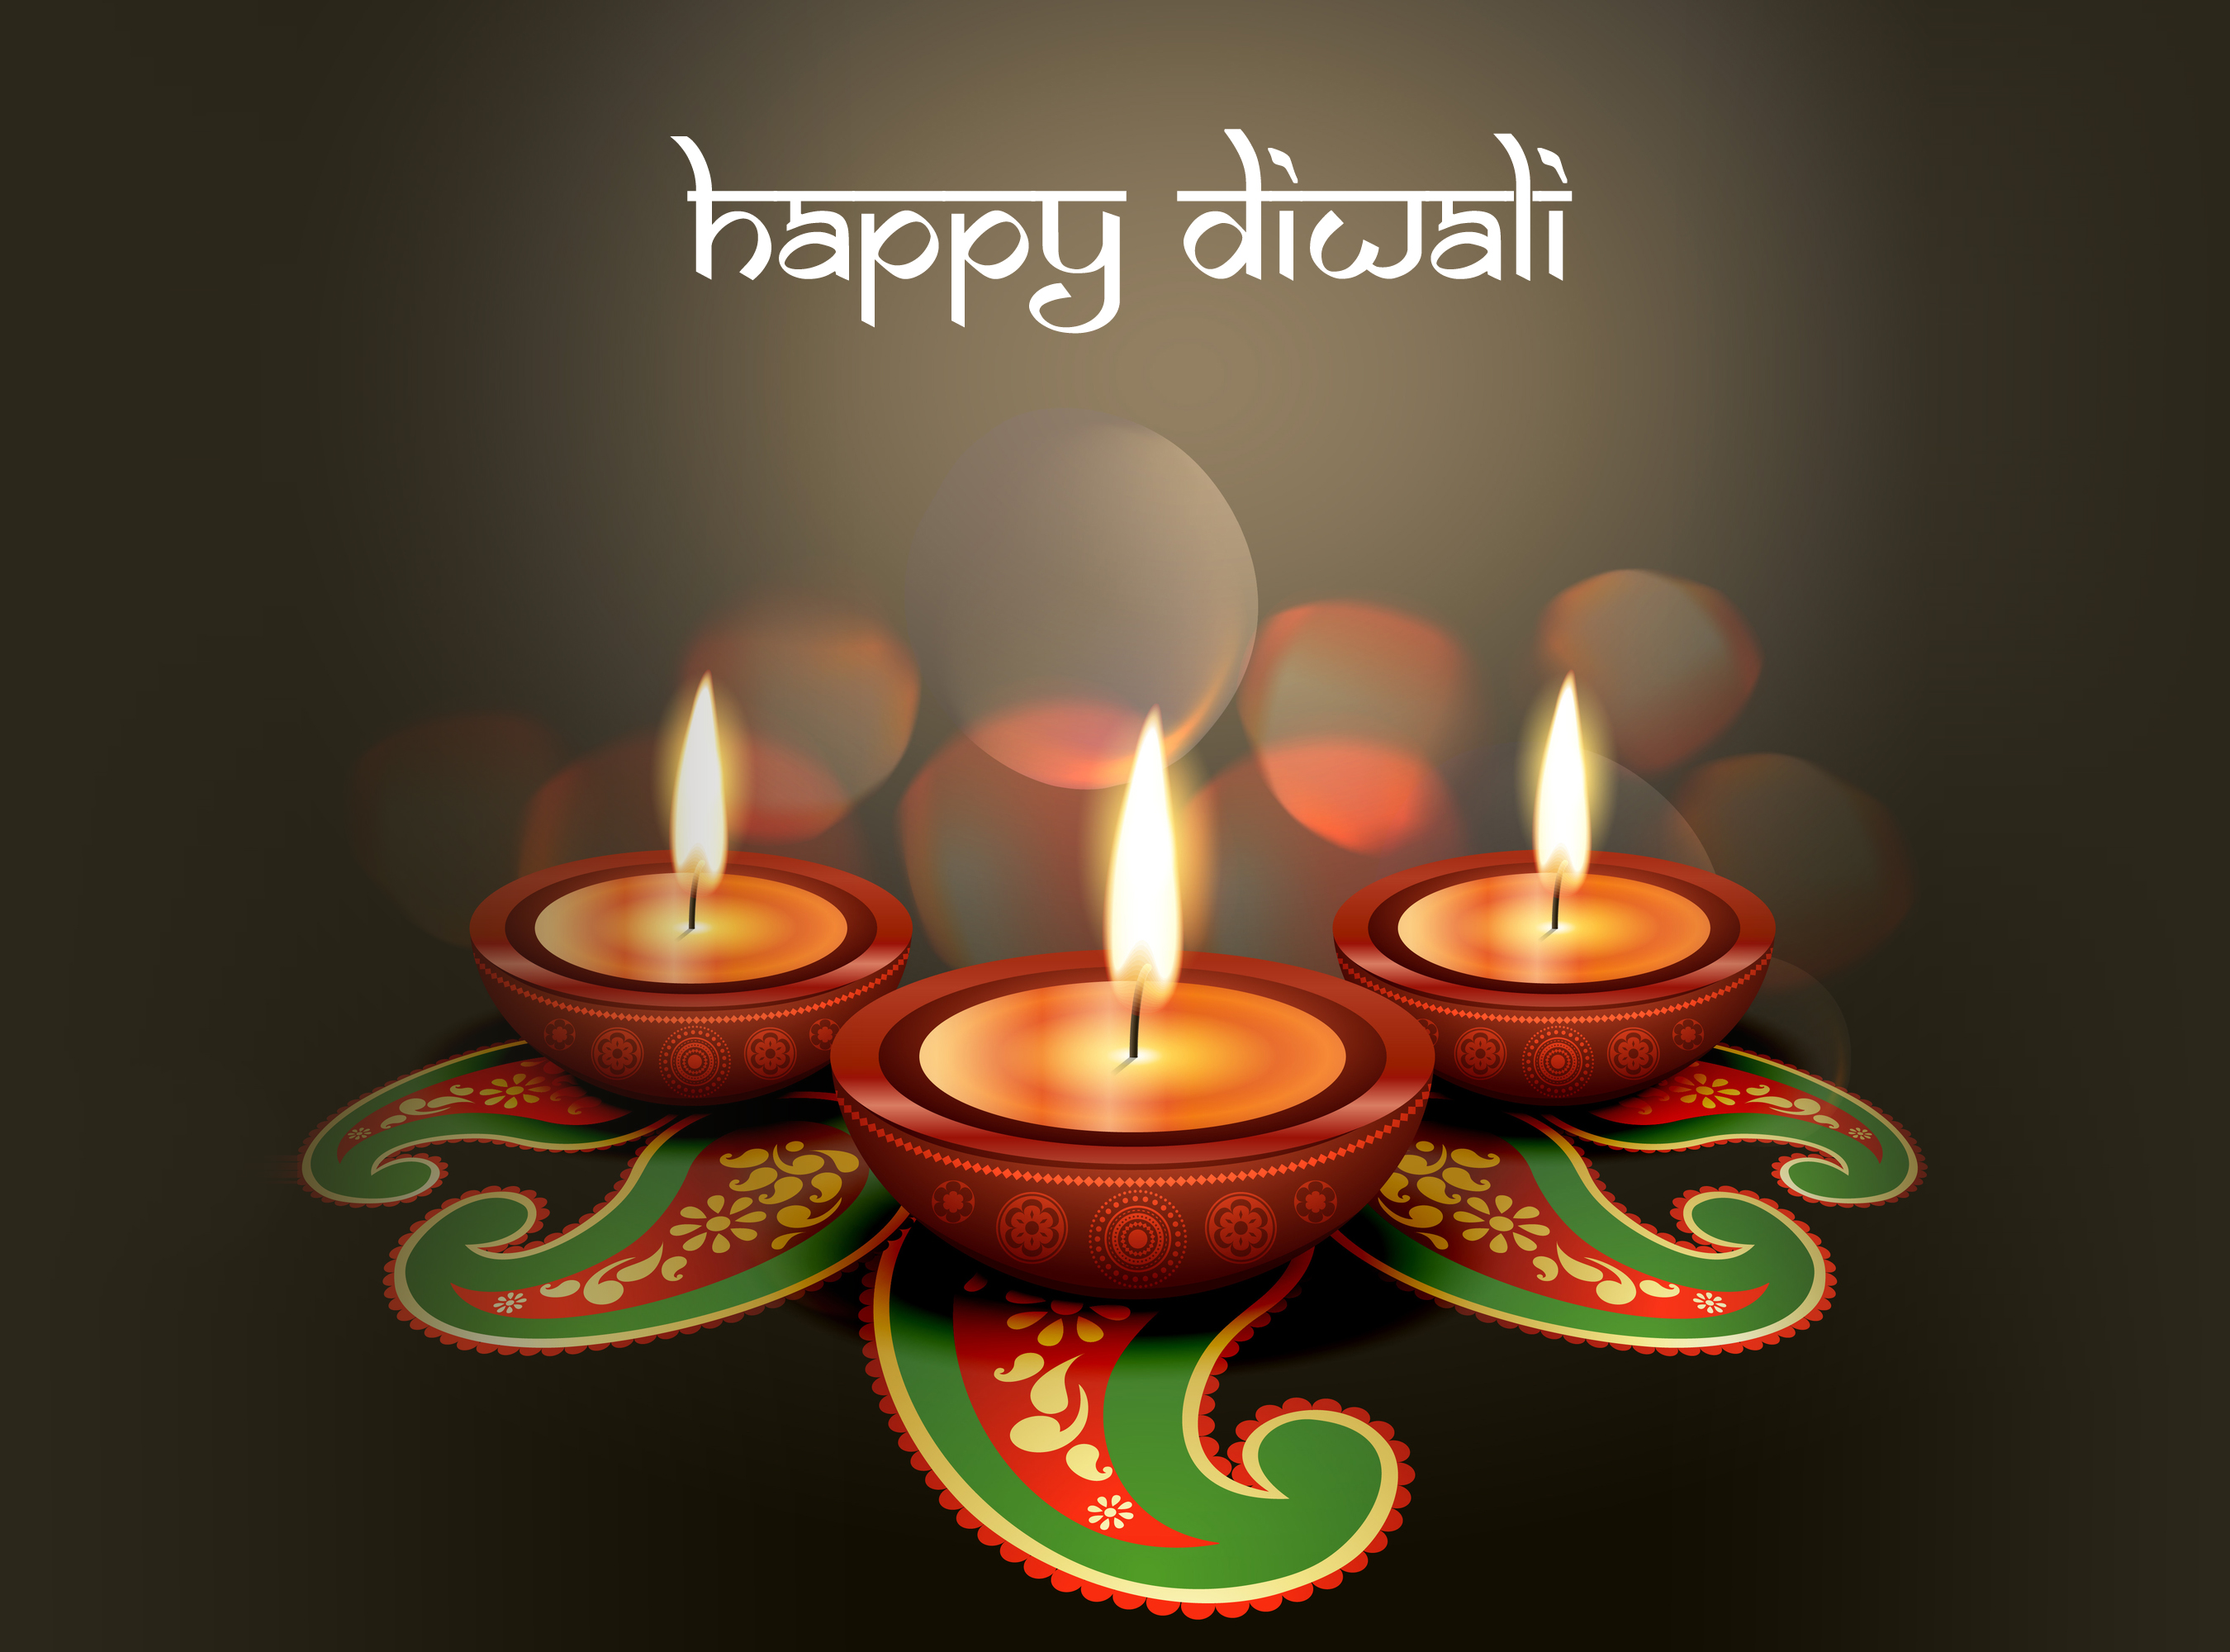 2017 Diwali Images